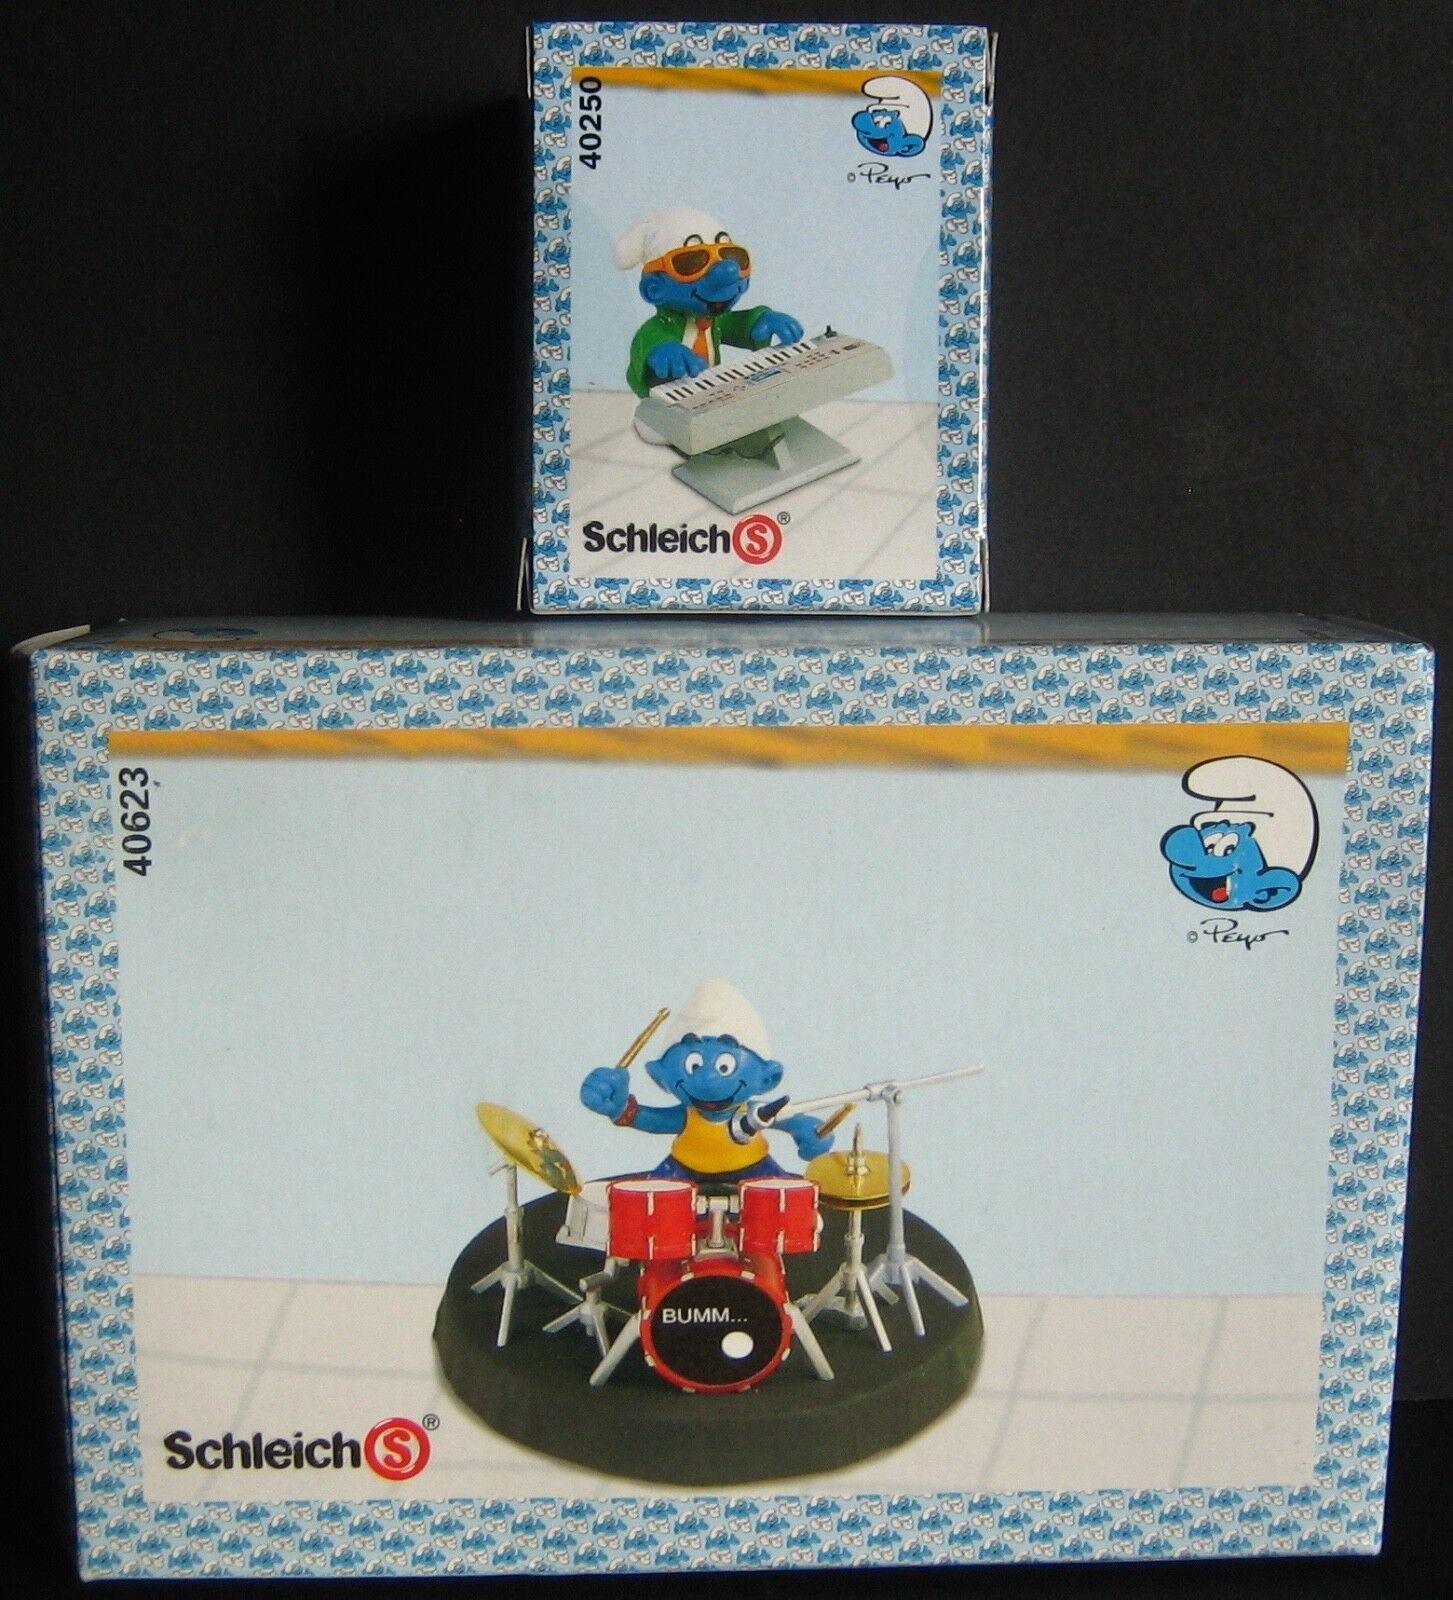 Schleich Smurfs Band Set of 6 different Figures Drummer 40623 New In Sealed Box